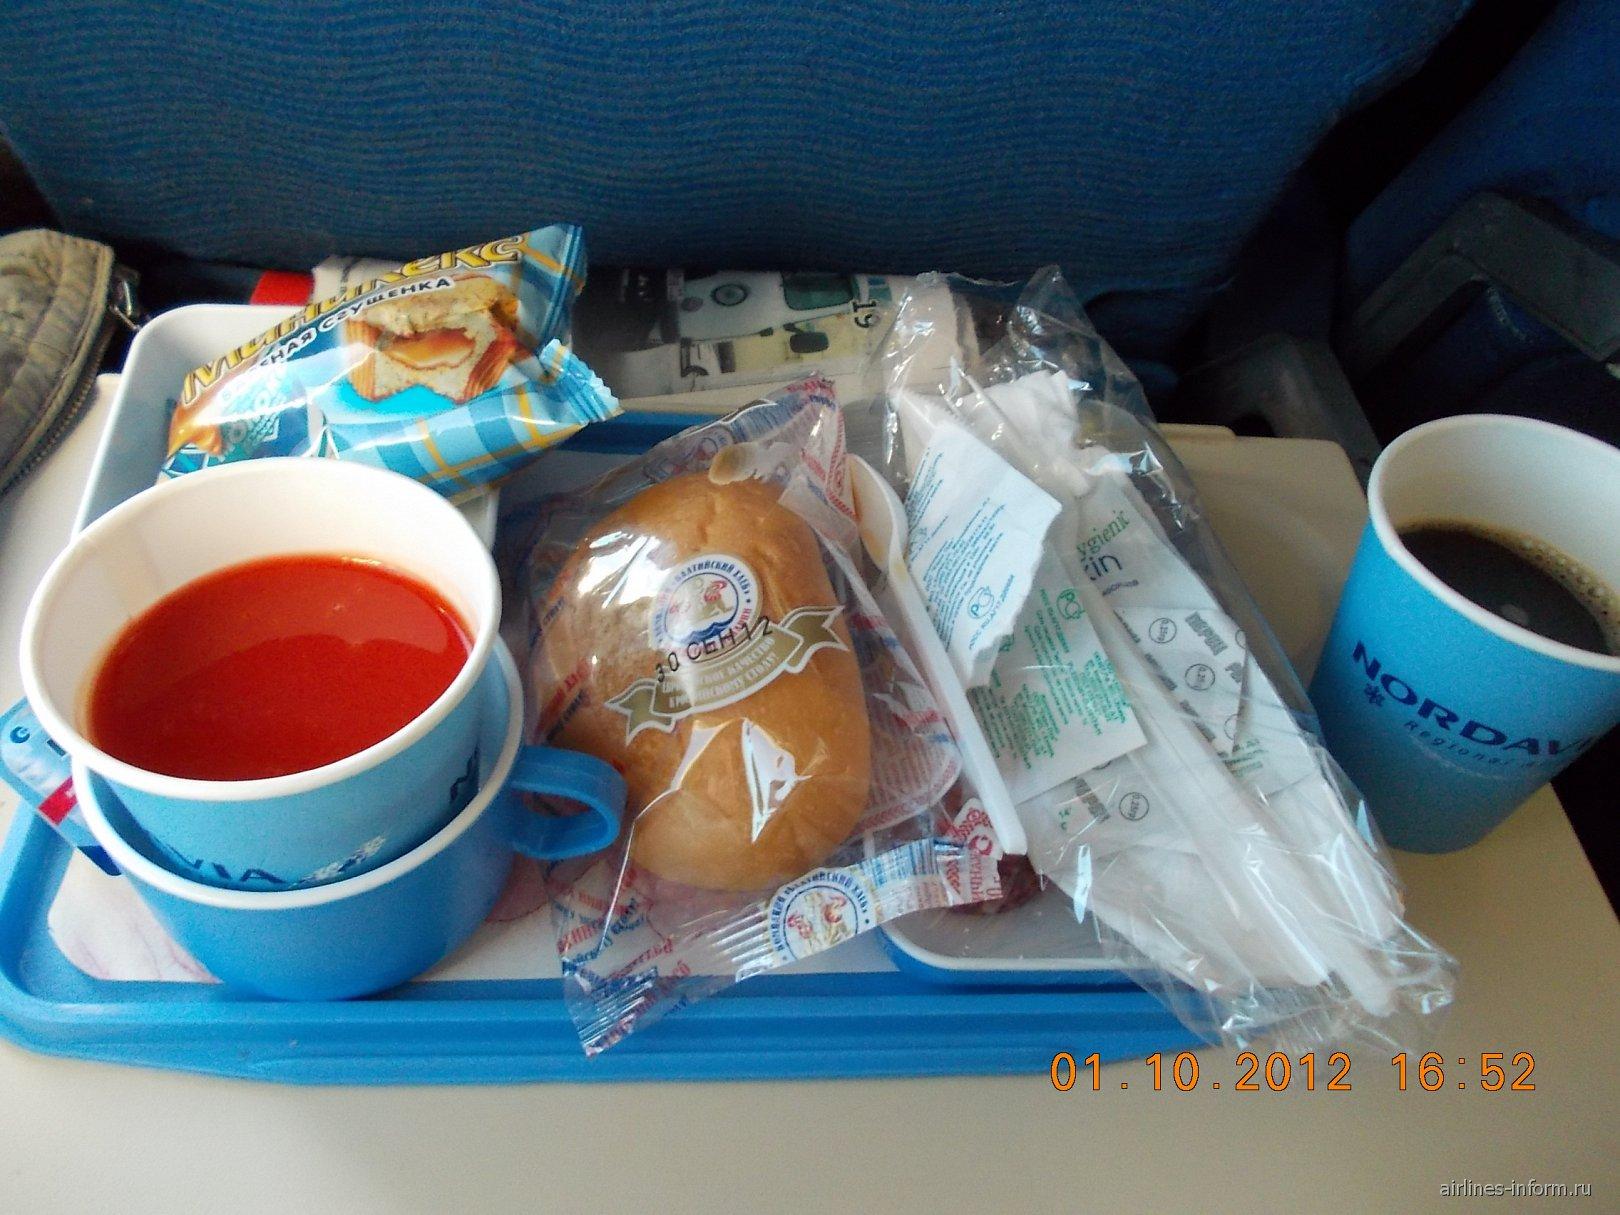 Питание на рейсе Сыктывкар-Санкт-Петербург авиакомпании Нордавиа